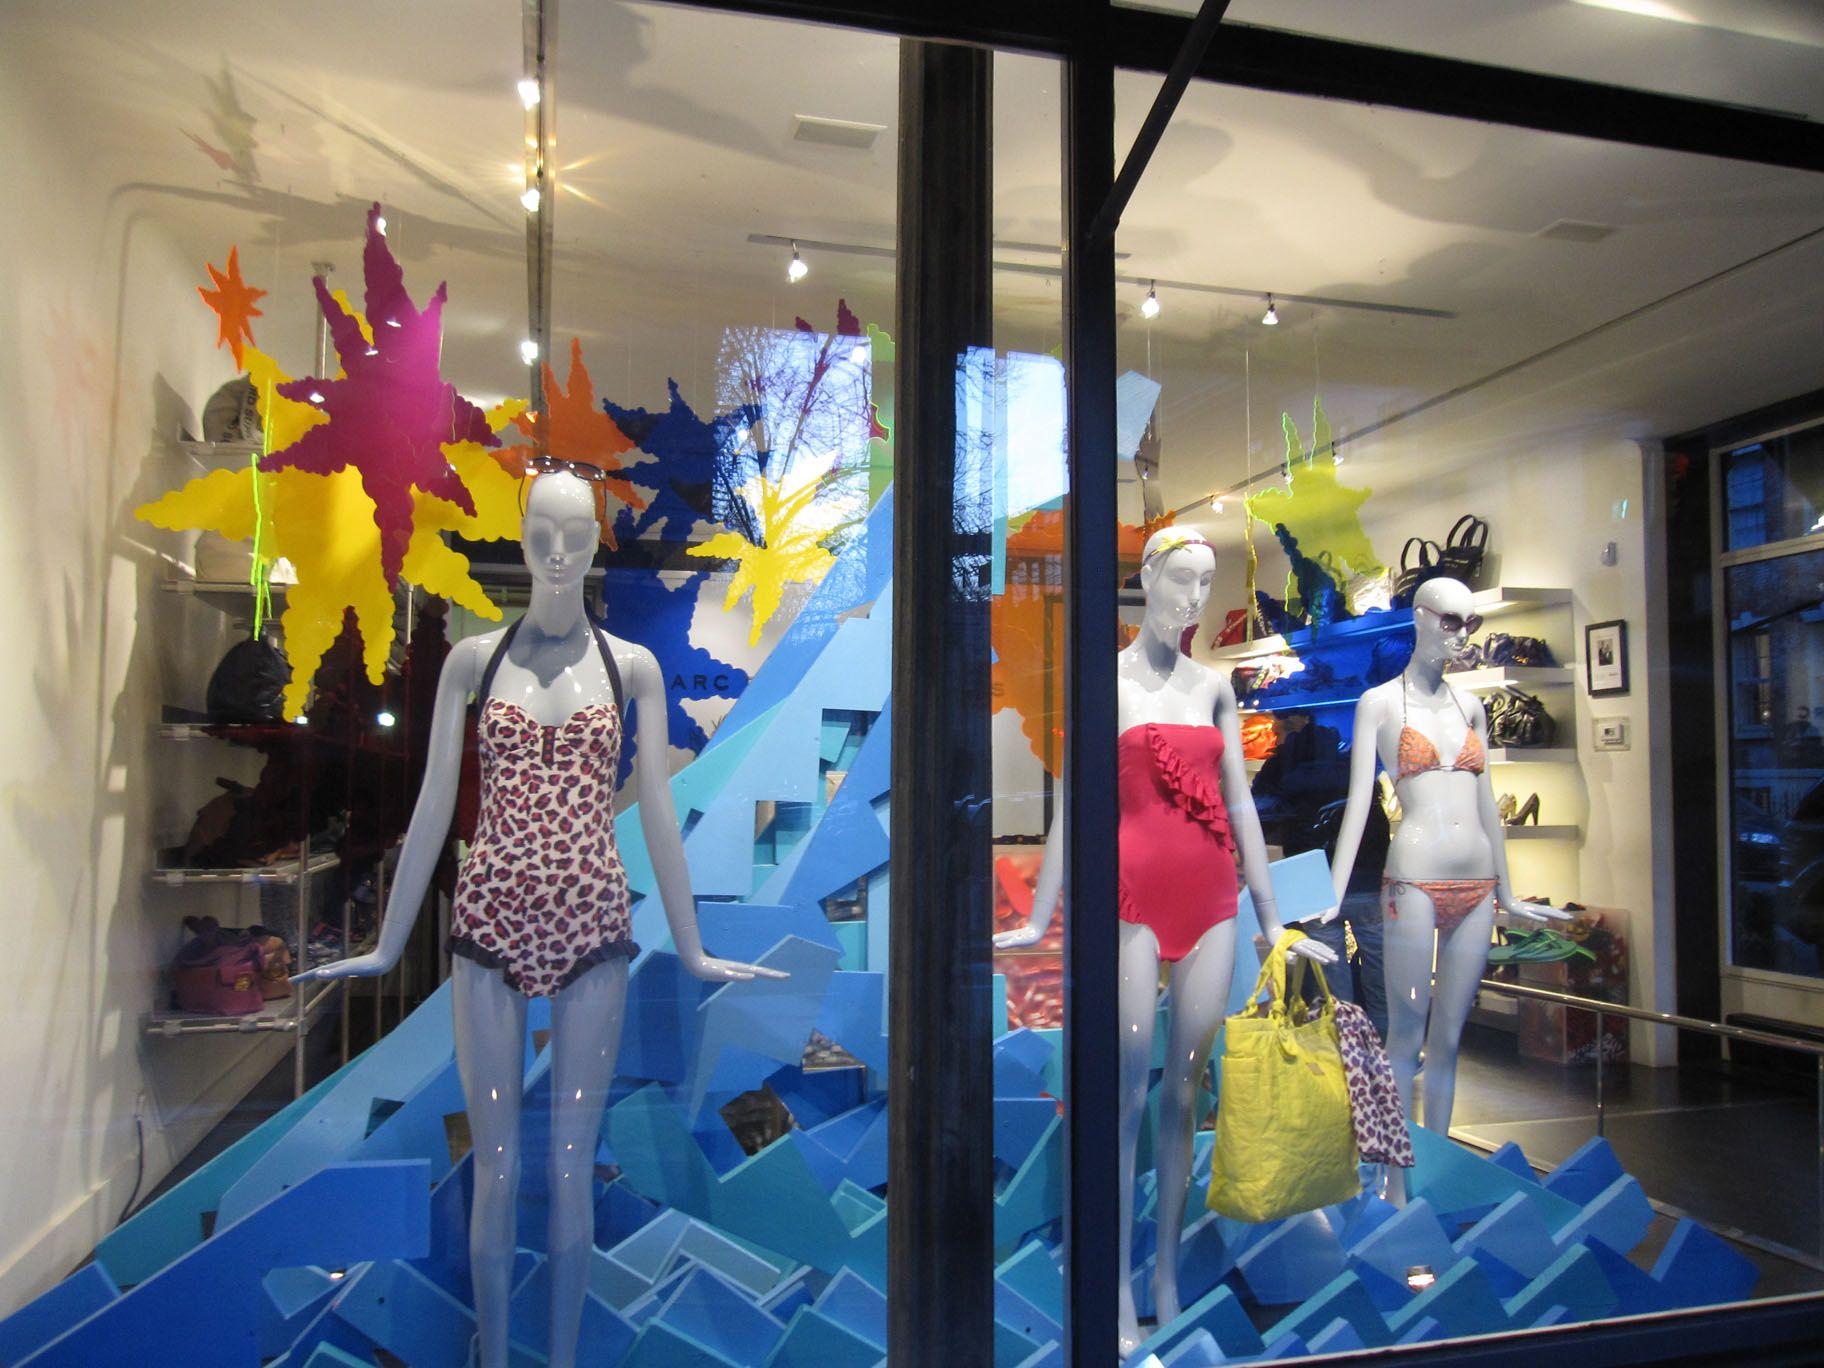 Vcg colourlink inspiration window display visual merchandising summer 2015 ibiza beach holiday summer